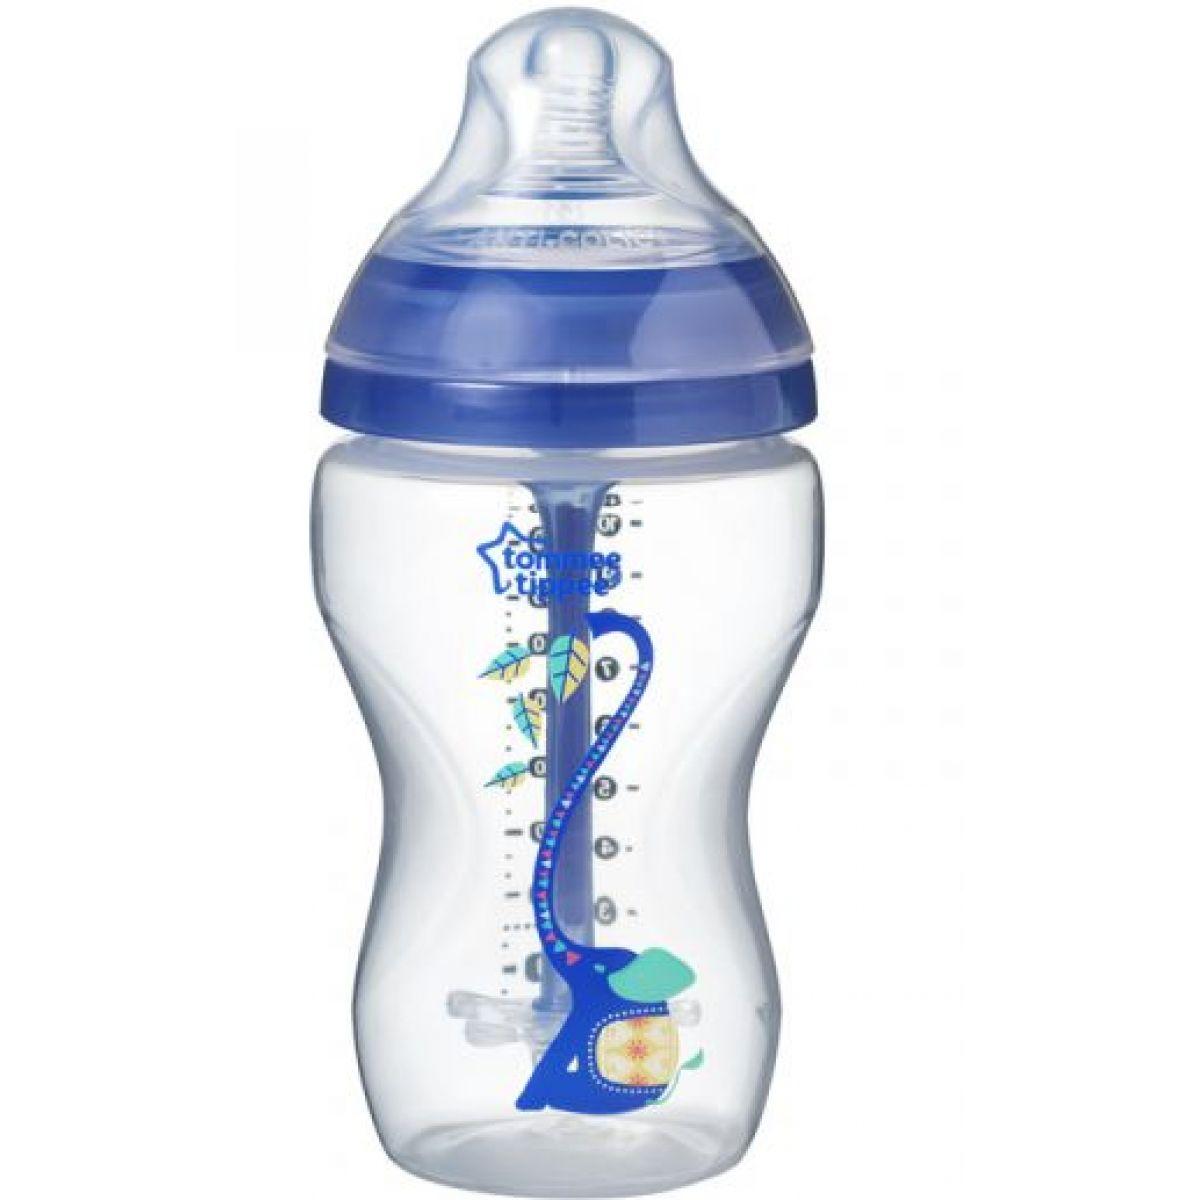 Tommee Tippee Dojčenská fľaša C2N ANTI-COLIC Boy 340 ml 3m +